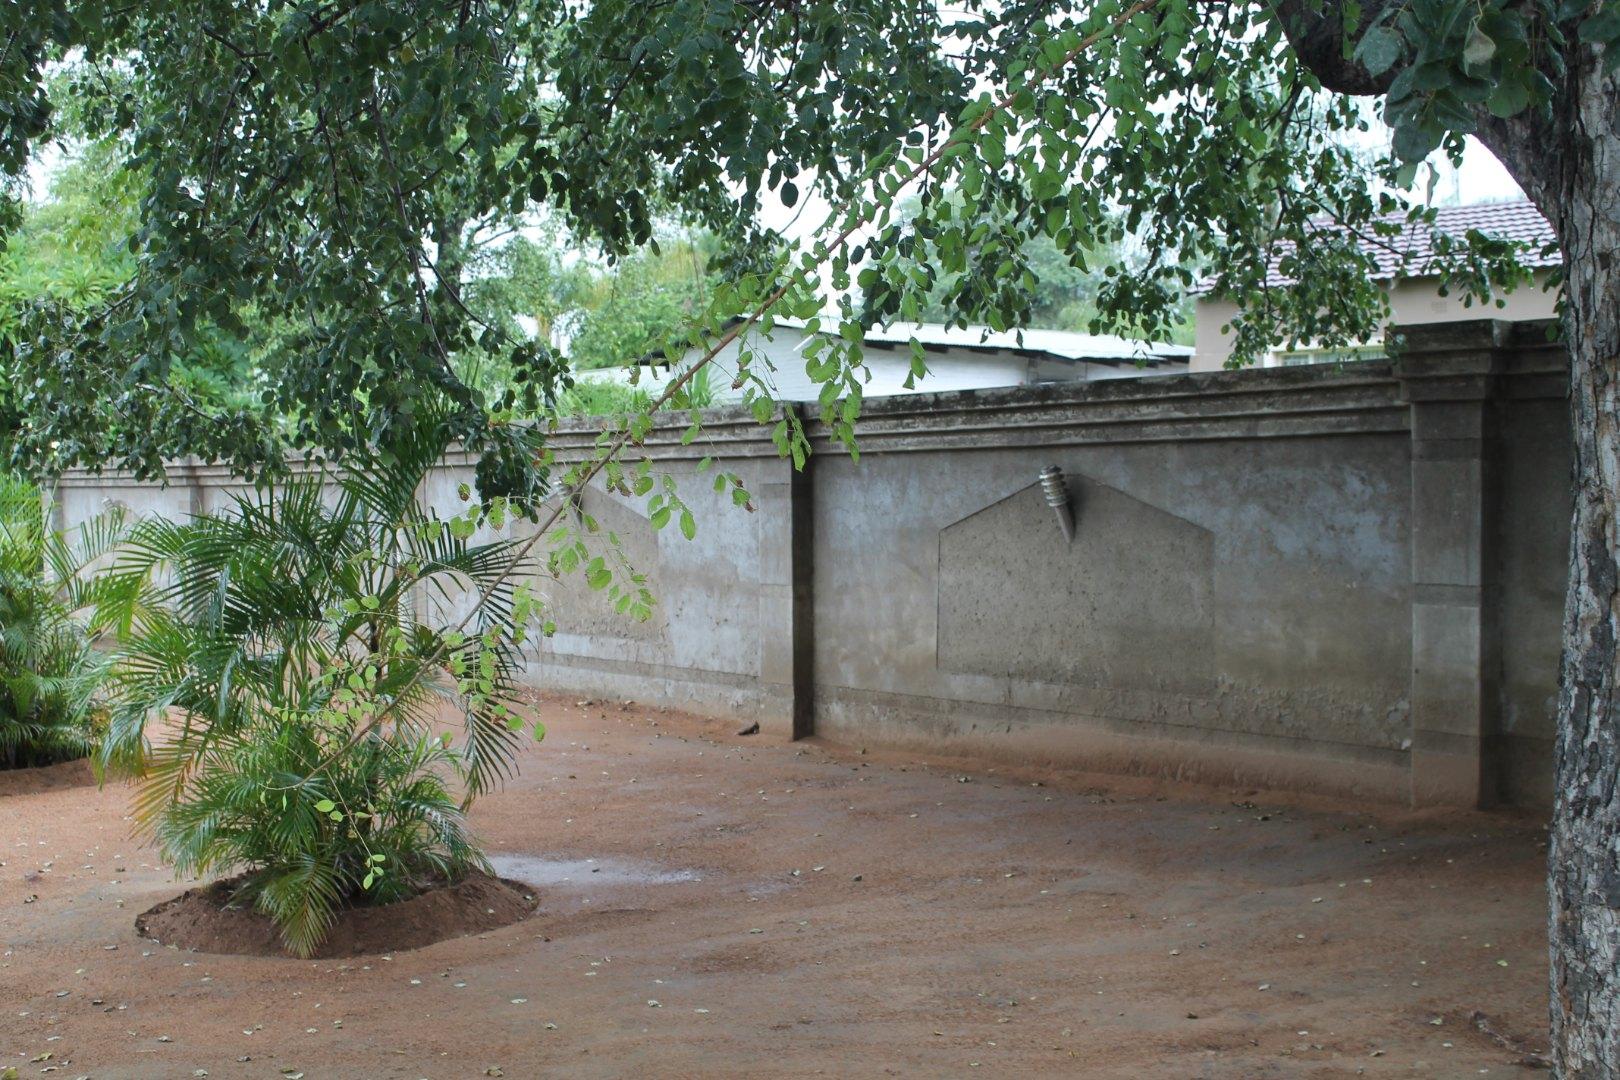 3 Bedroom House For Sale in Phalaborwa